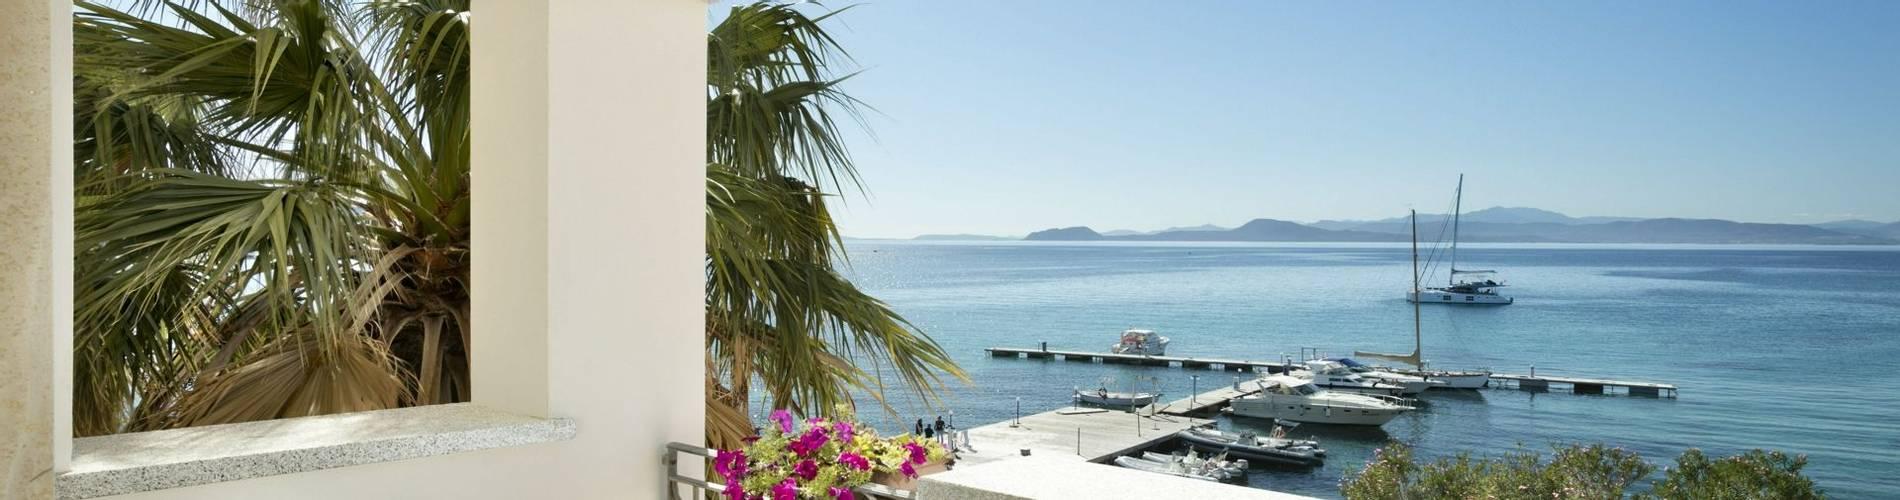 Comfort Sea View -balcony- Gabbiano Azzurro Hotel _ Suites Sardegna - stampa1.jpg